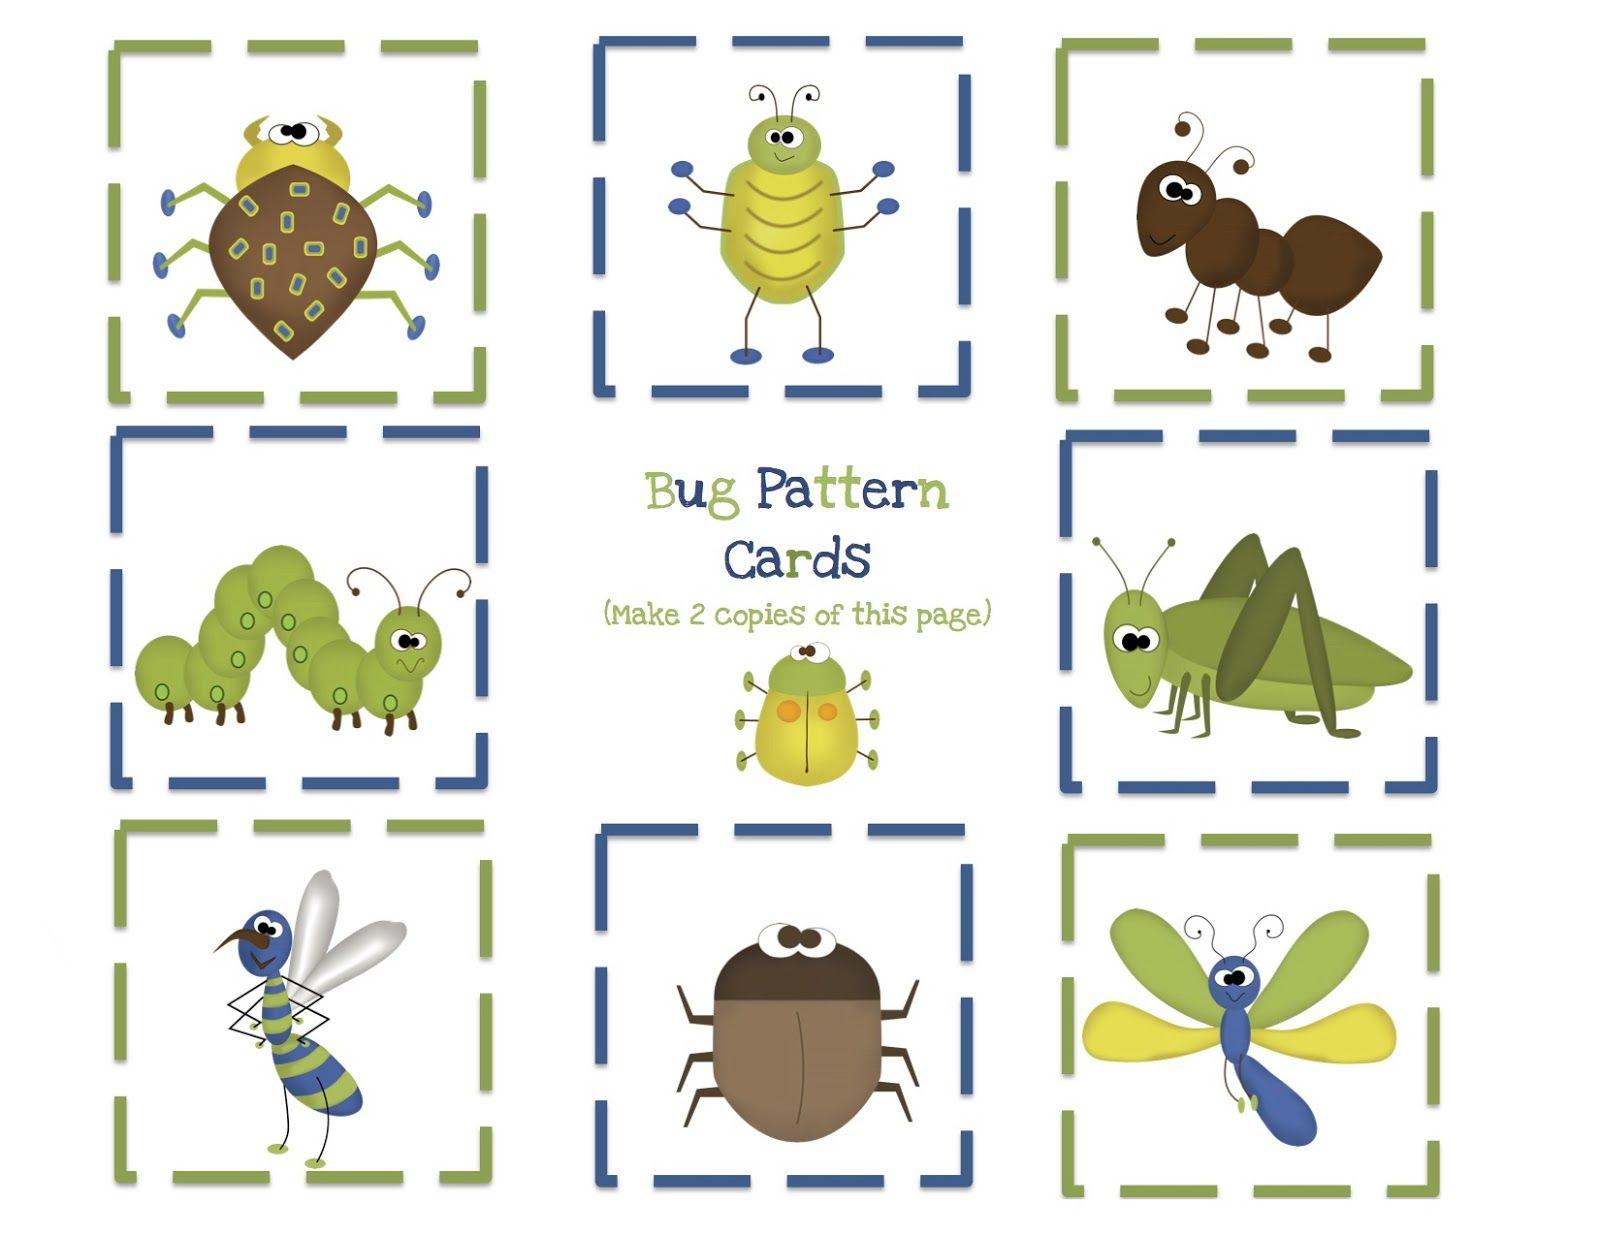 Bug Pattern Cards Jpg 1 600 1 236 Pixels Bugs Preschool Preschool Bug Theme Preschool Printables